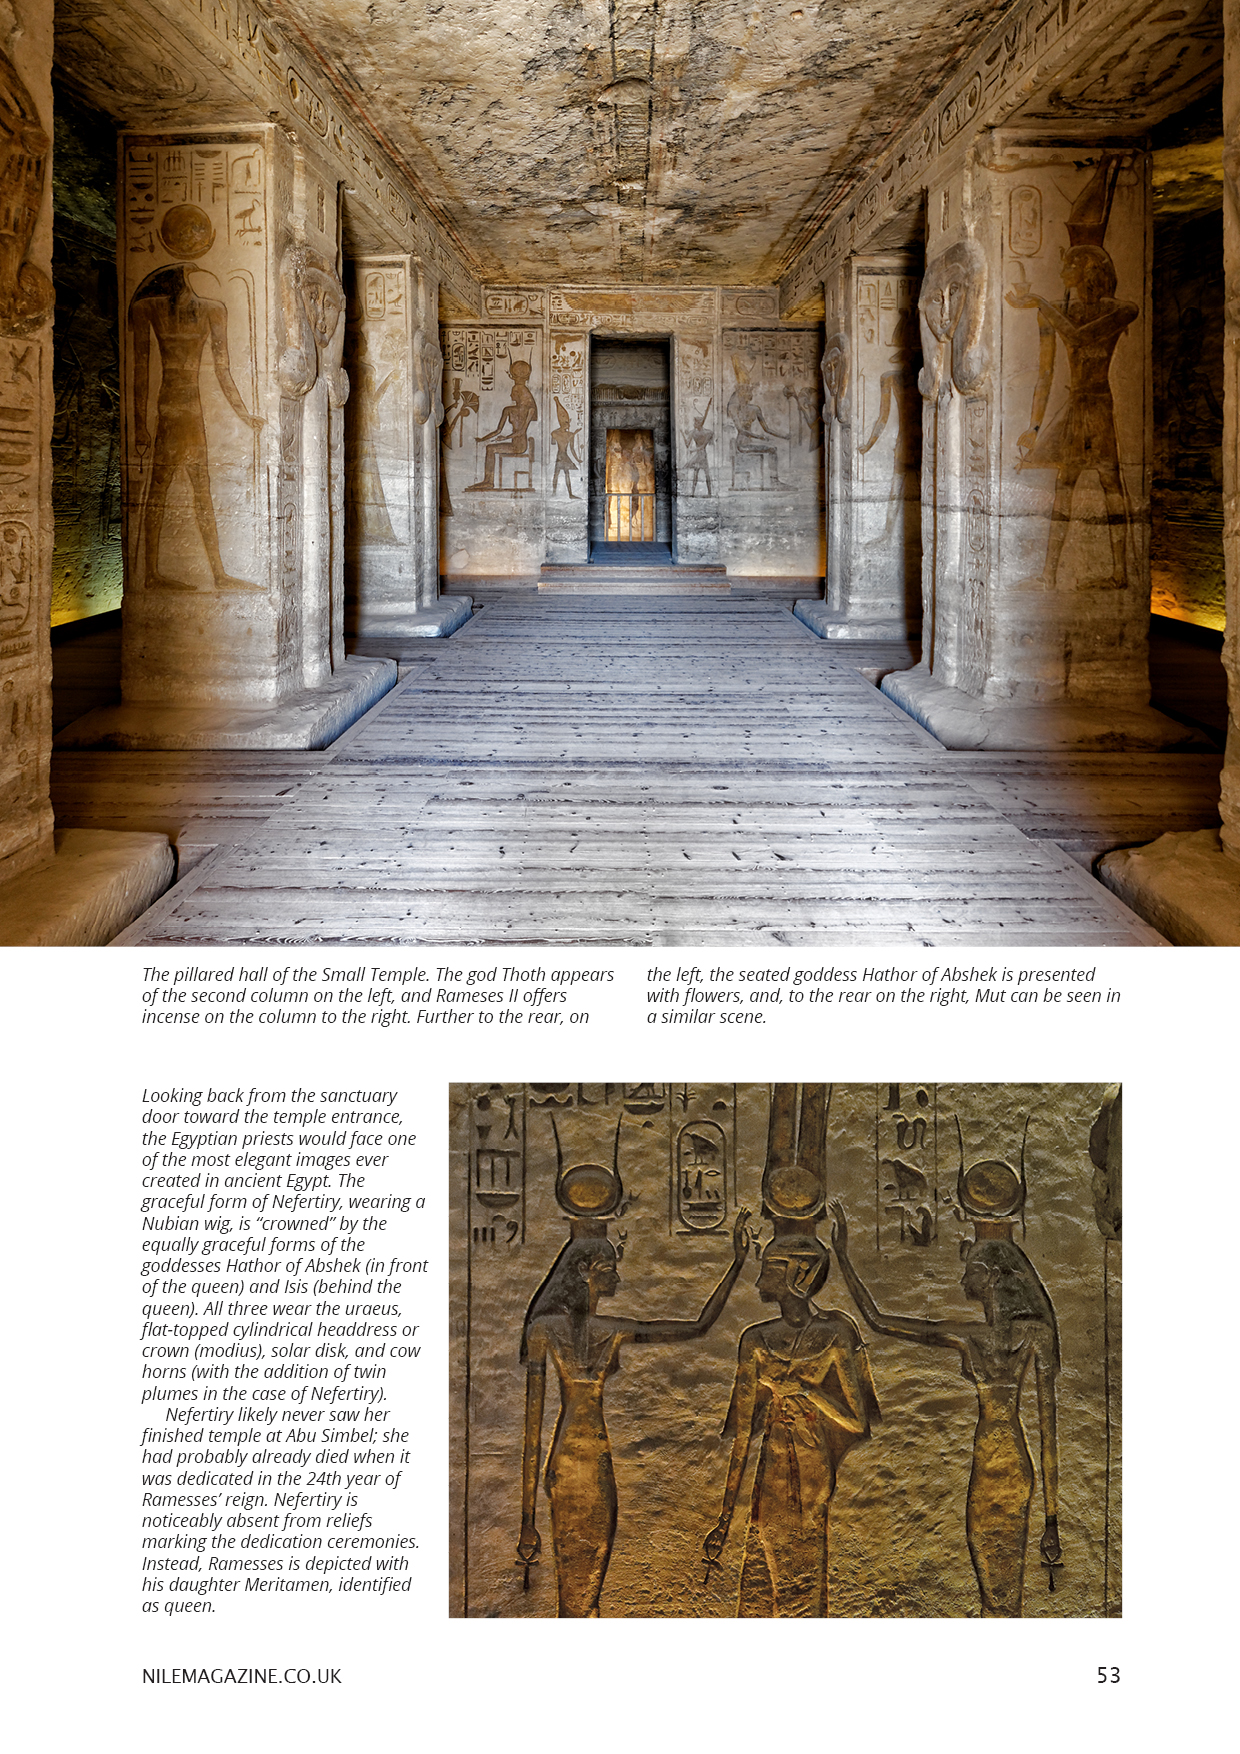 Nile 18, Abu Simbel 4 1A.jpg